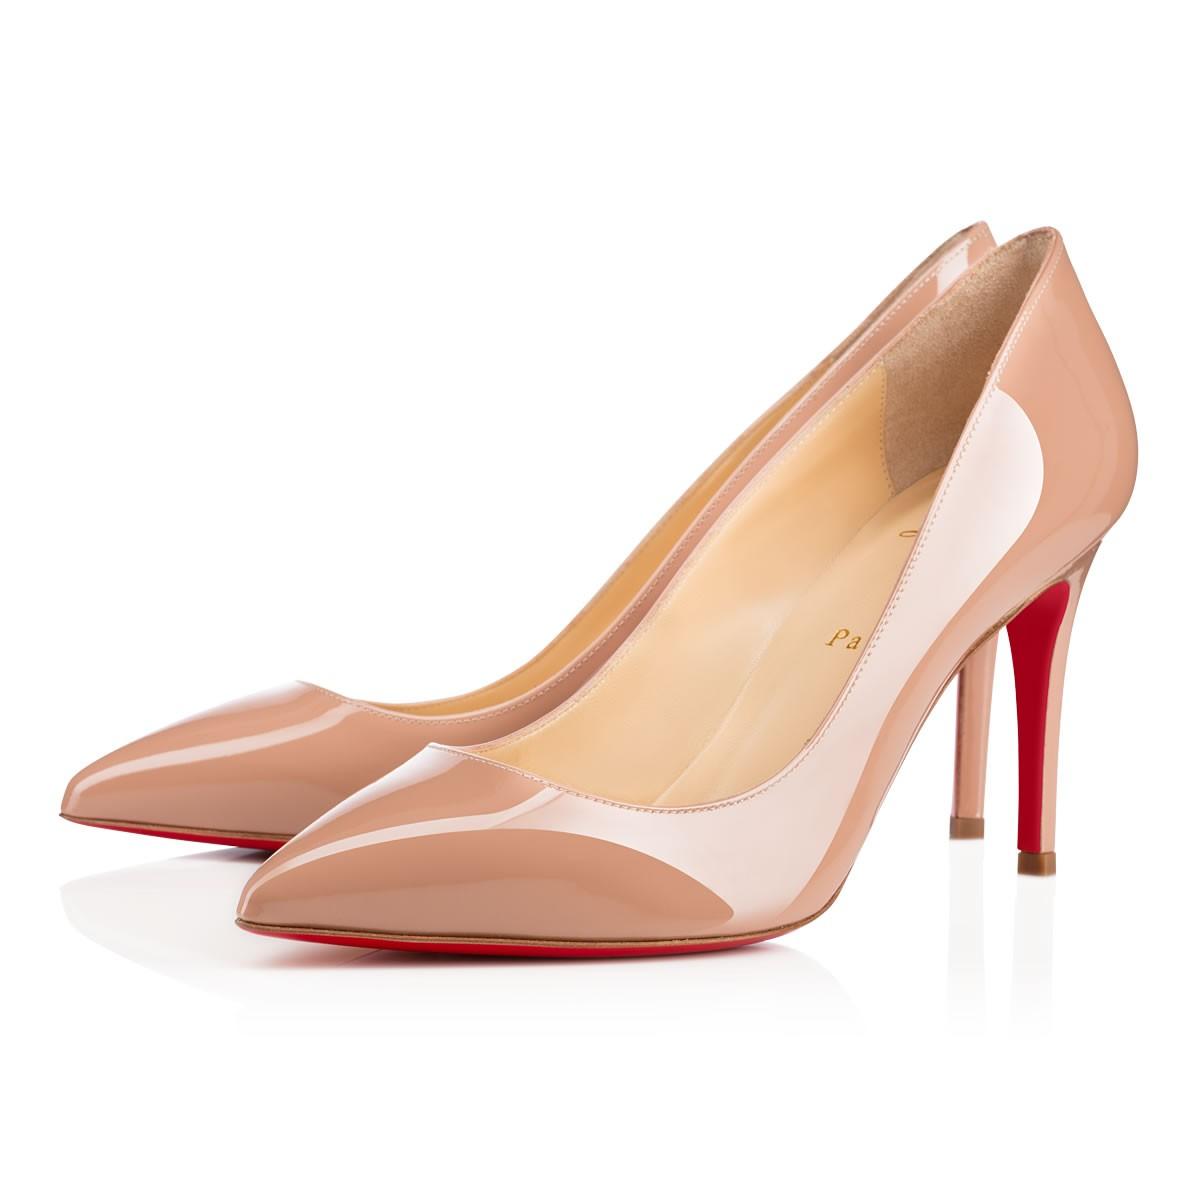 christian louboutin bridal shoes photo - 1